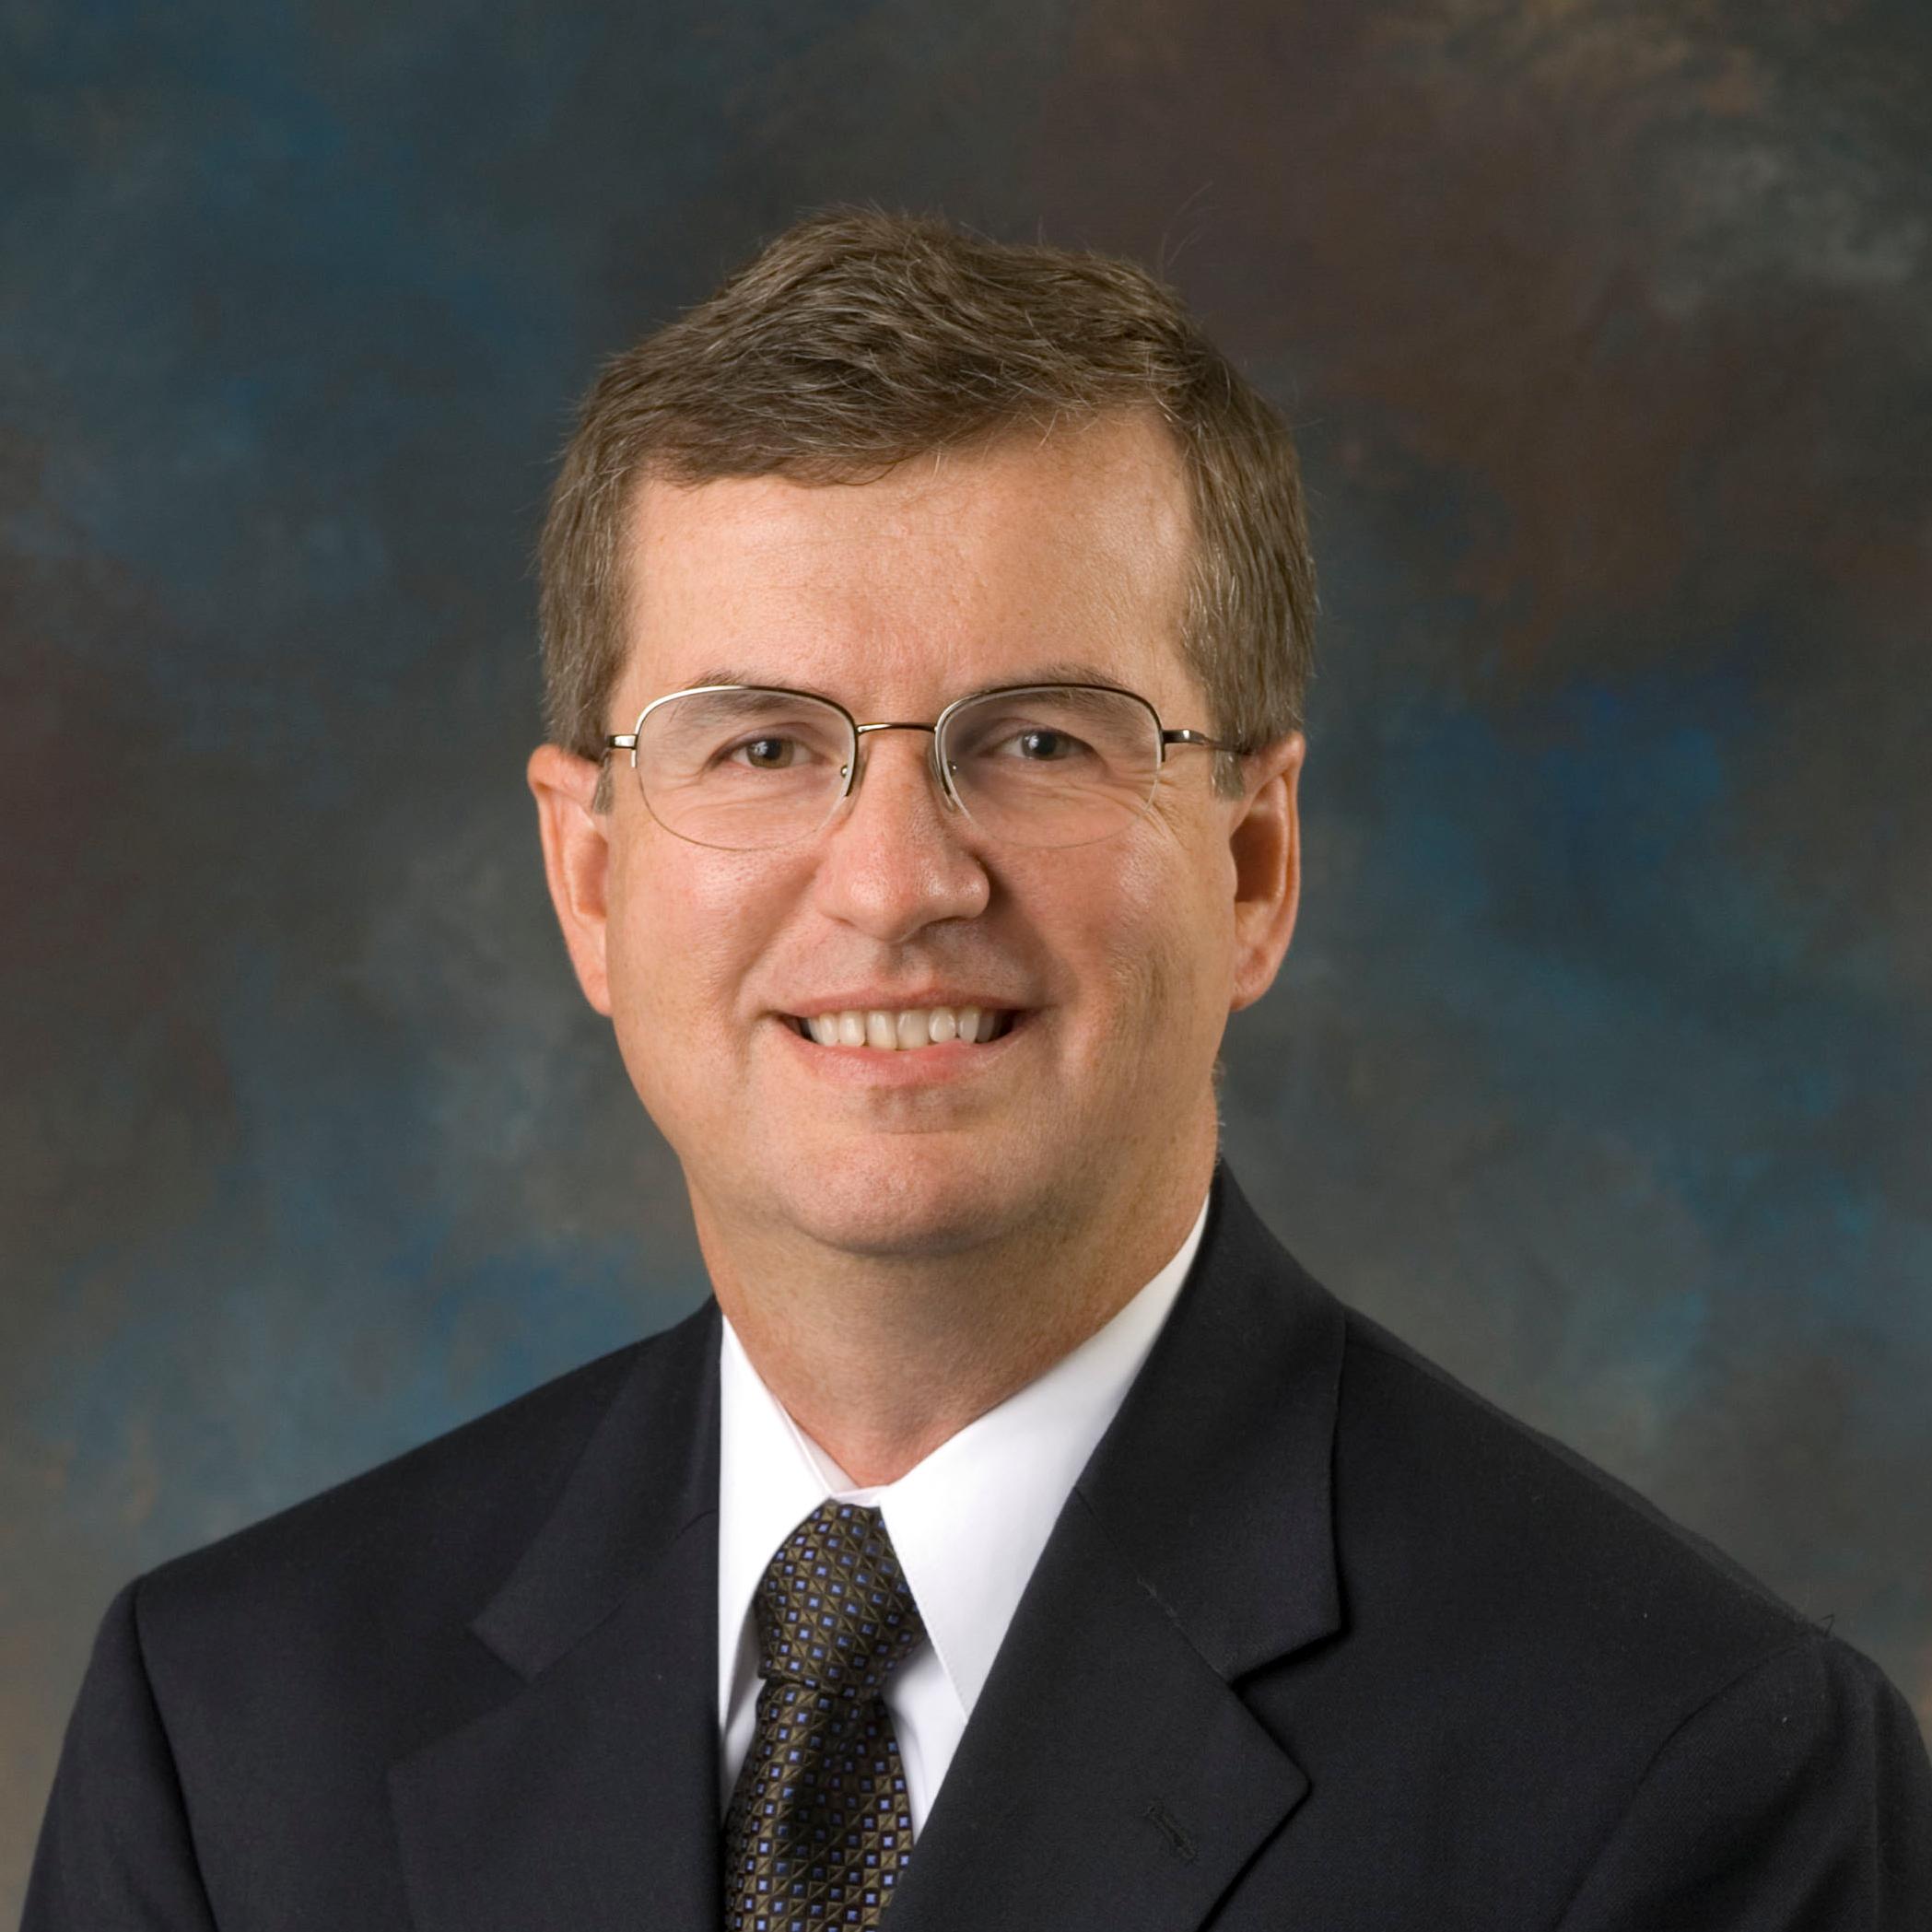 Jeffrey Hathaway